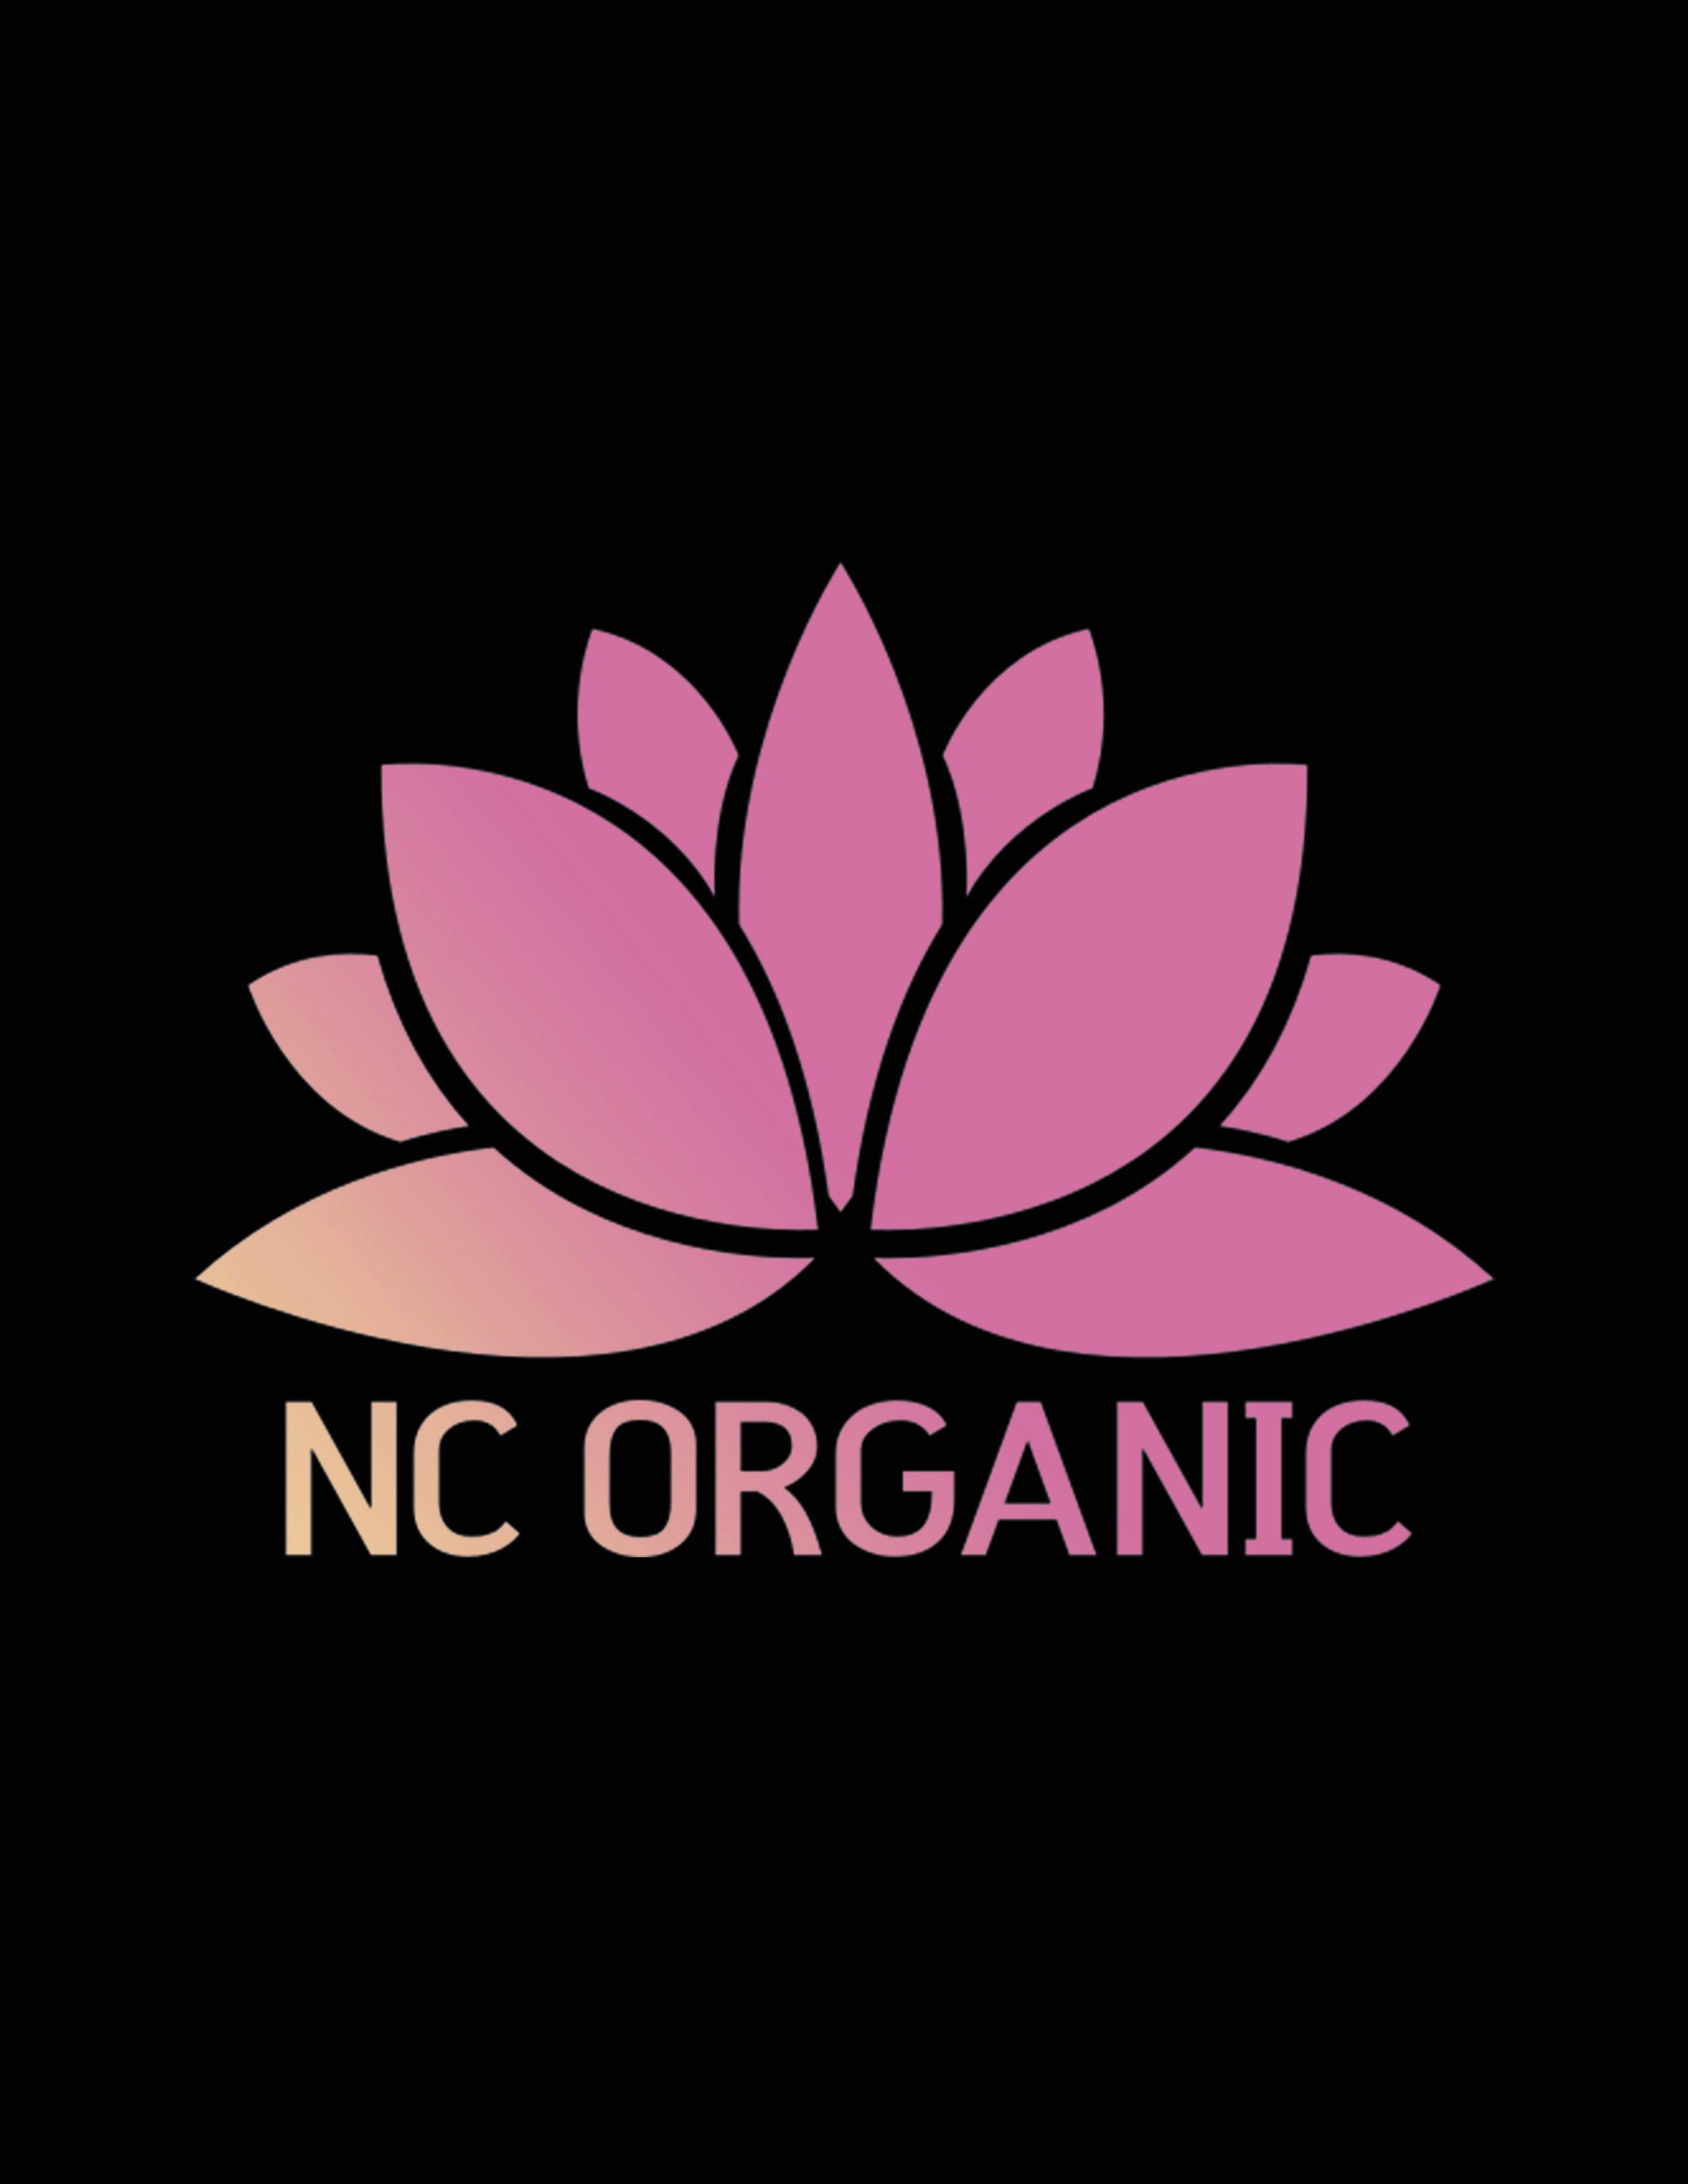 Nc Organic Logo